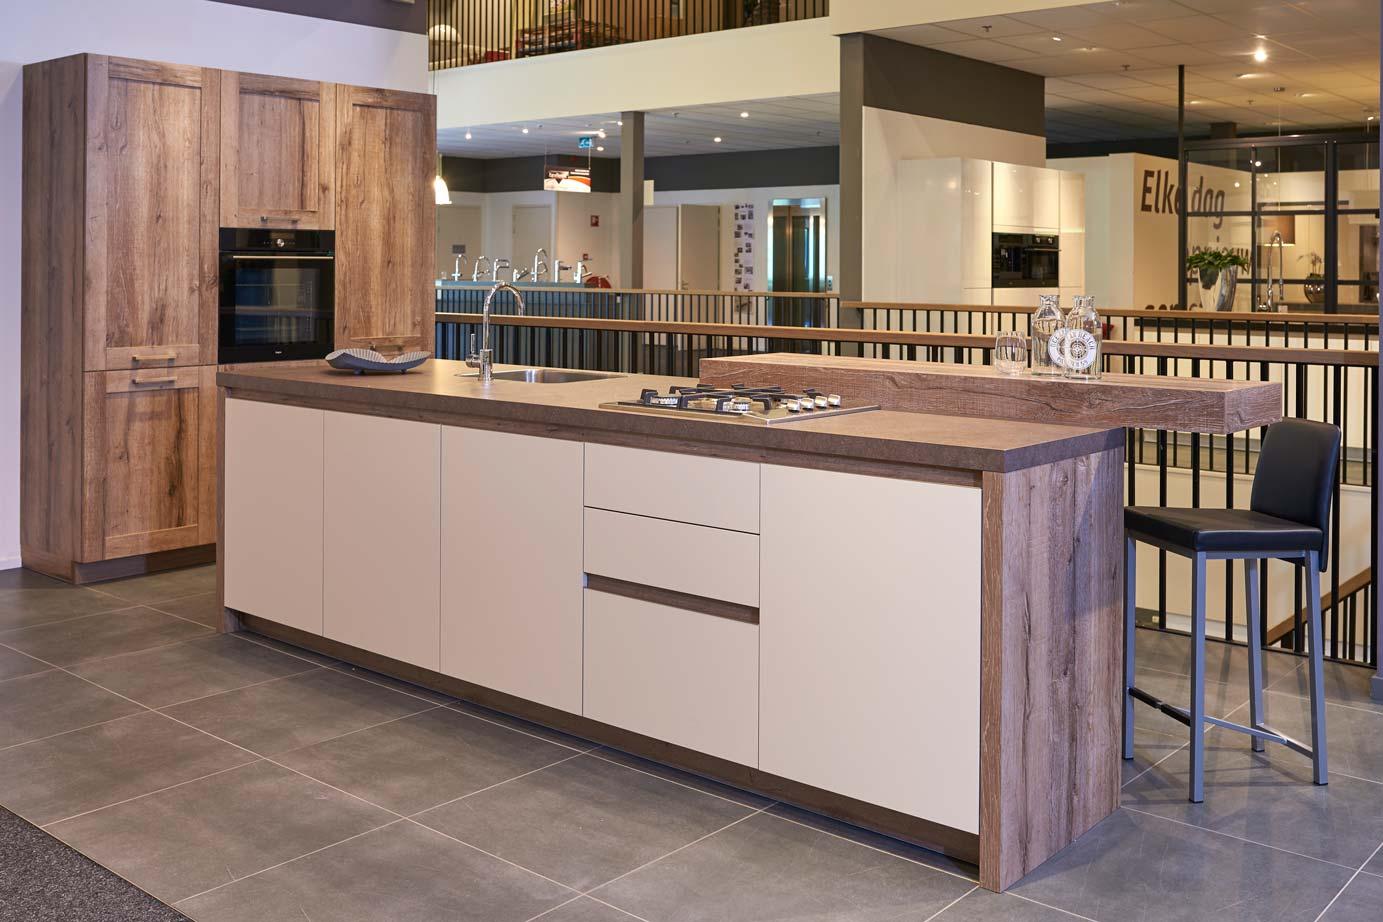 Modern keukeneiland met kastenwand bekijk foto s db keukens